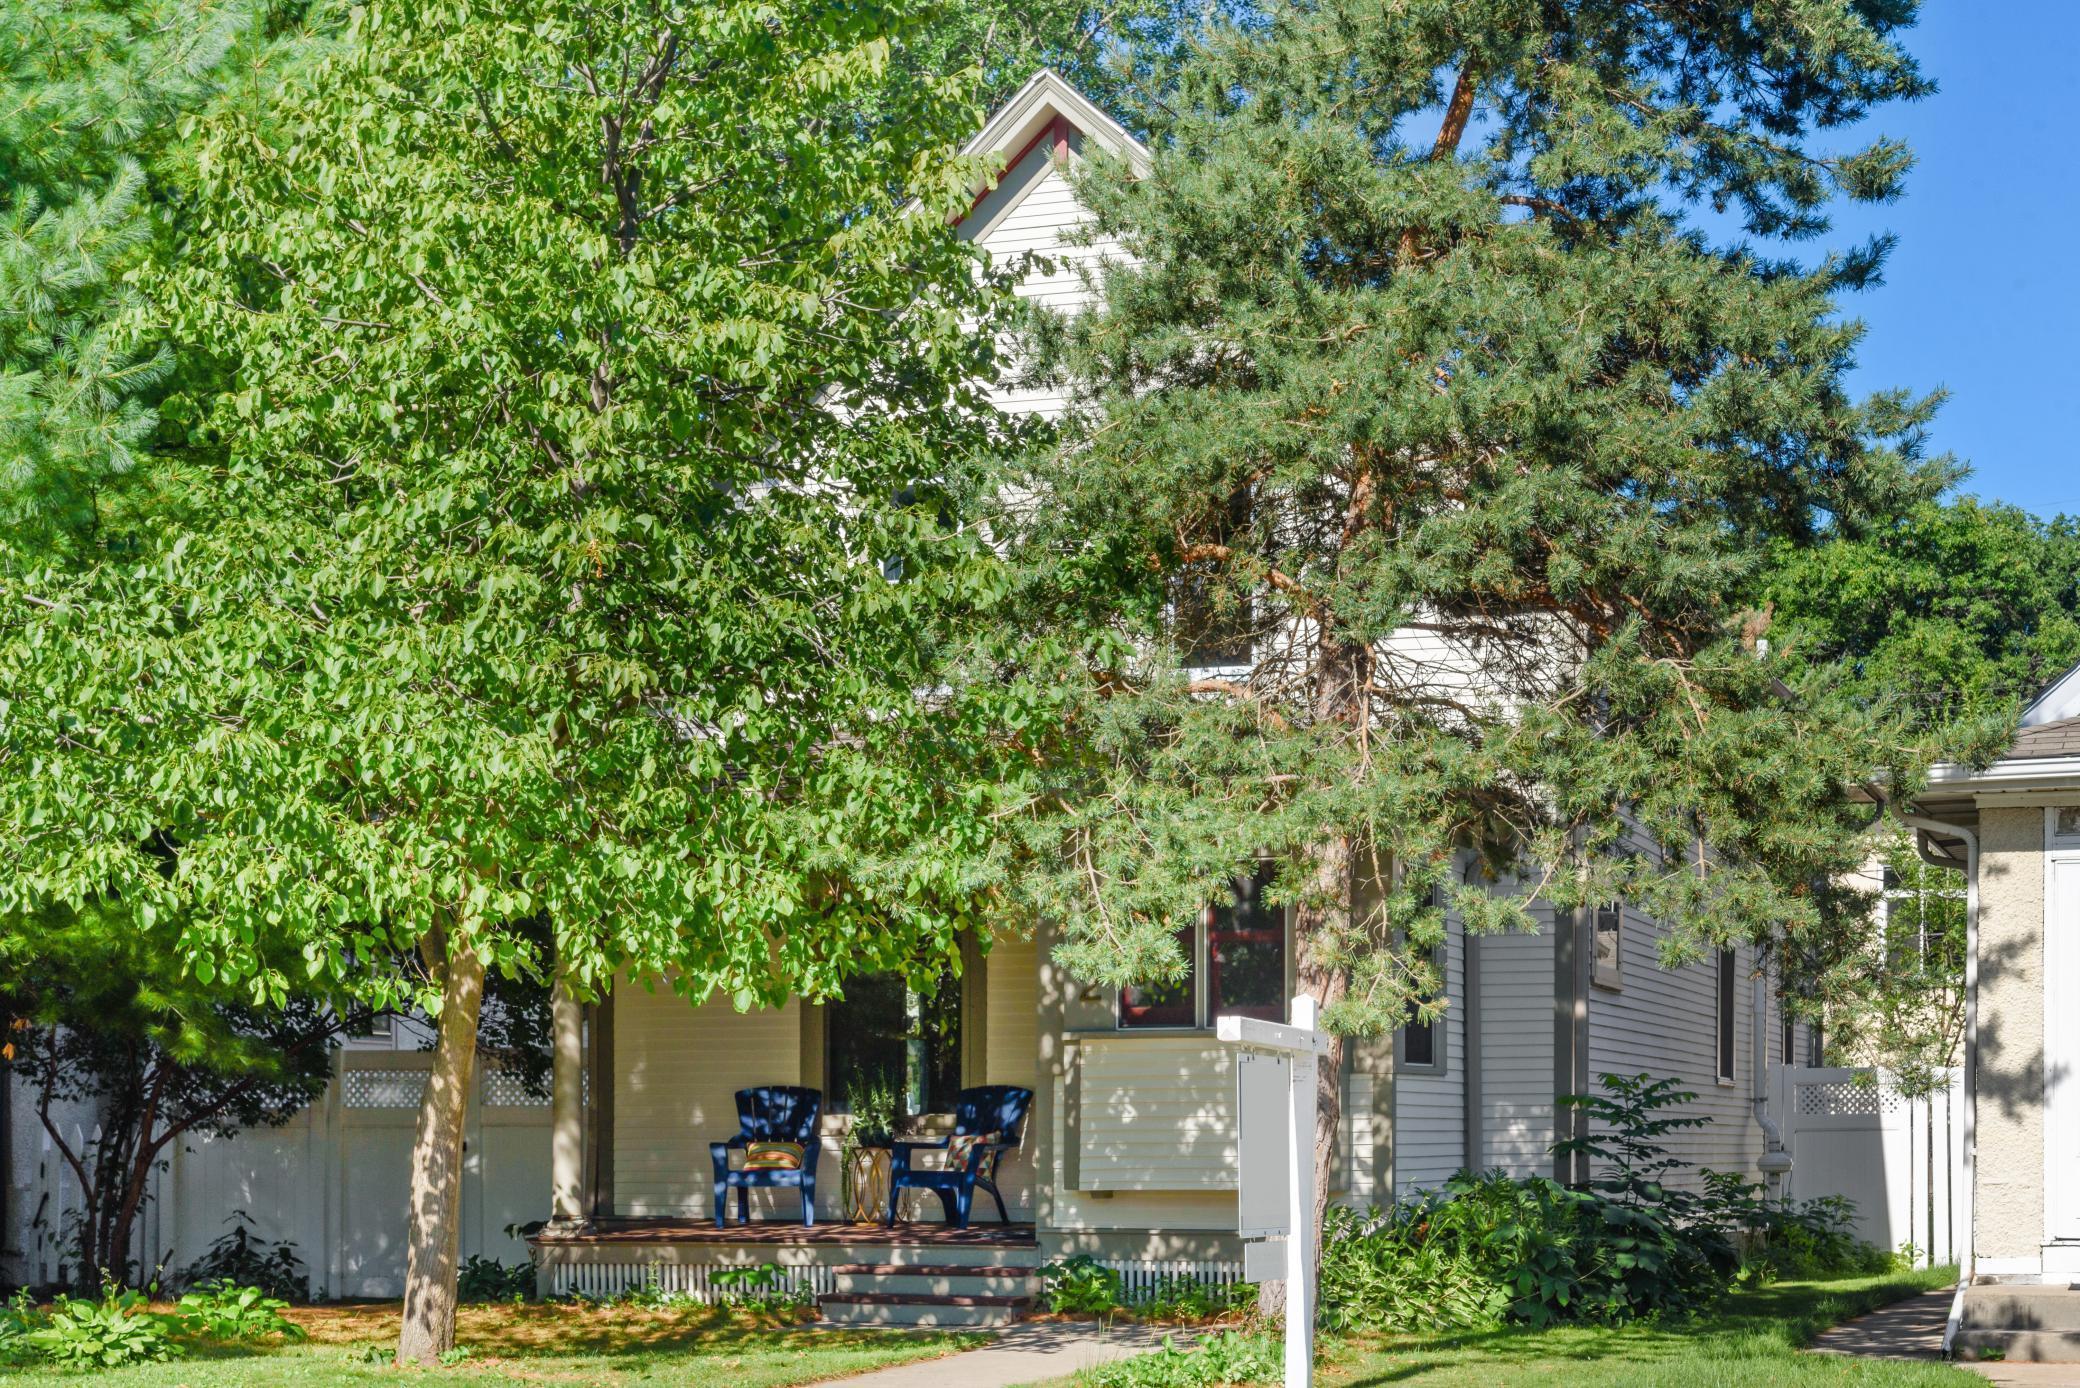 4112 Grand S Property Photo - Minneapolis, MN real estate listing